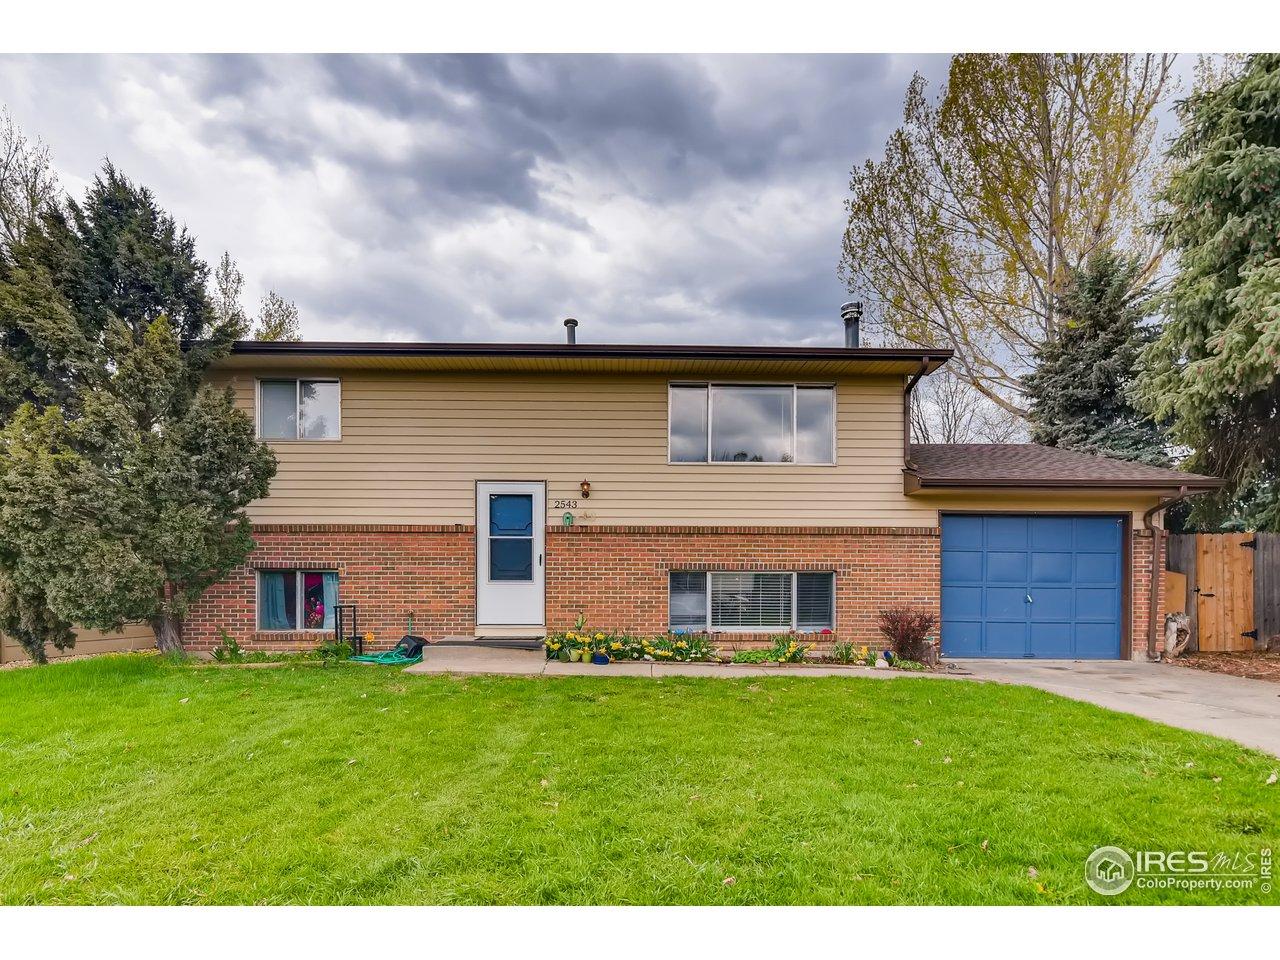 2543 W Laurel St, Fort Collins CO 80521